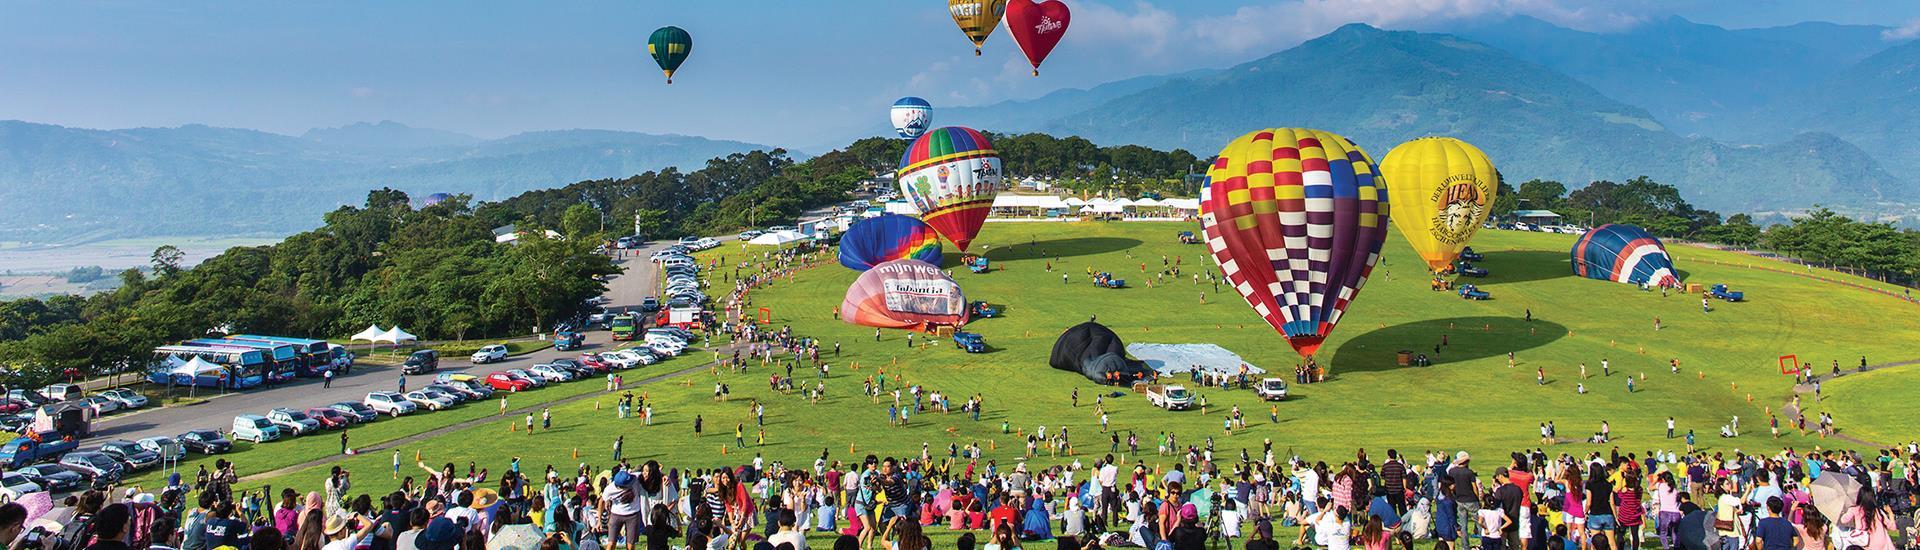 Carnaval Internacional de Globos aerostáticos de Taiwán